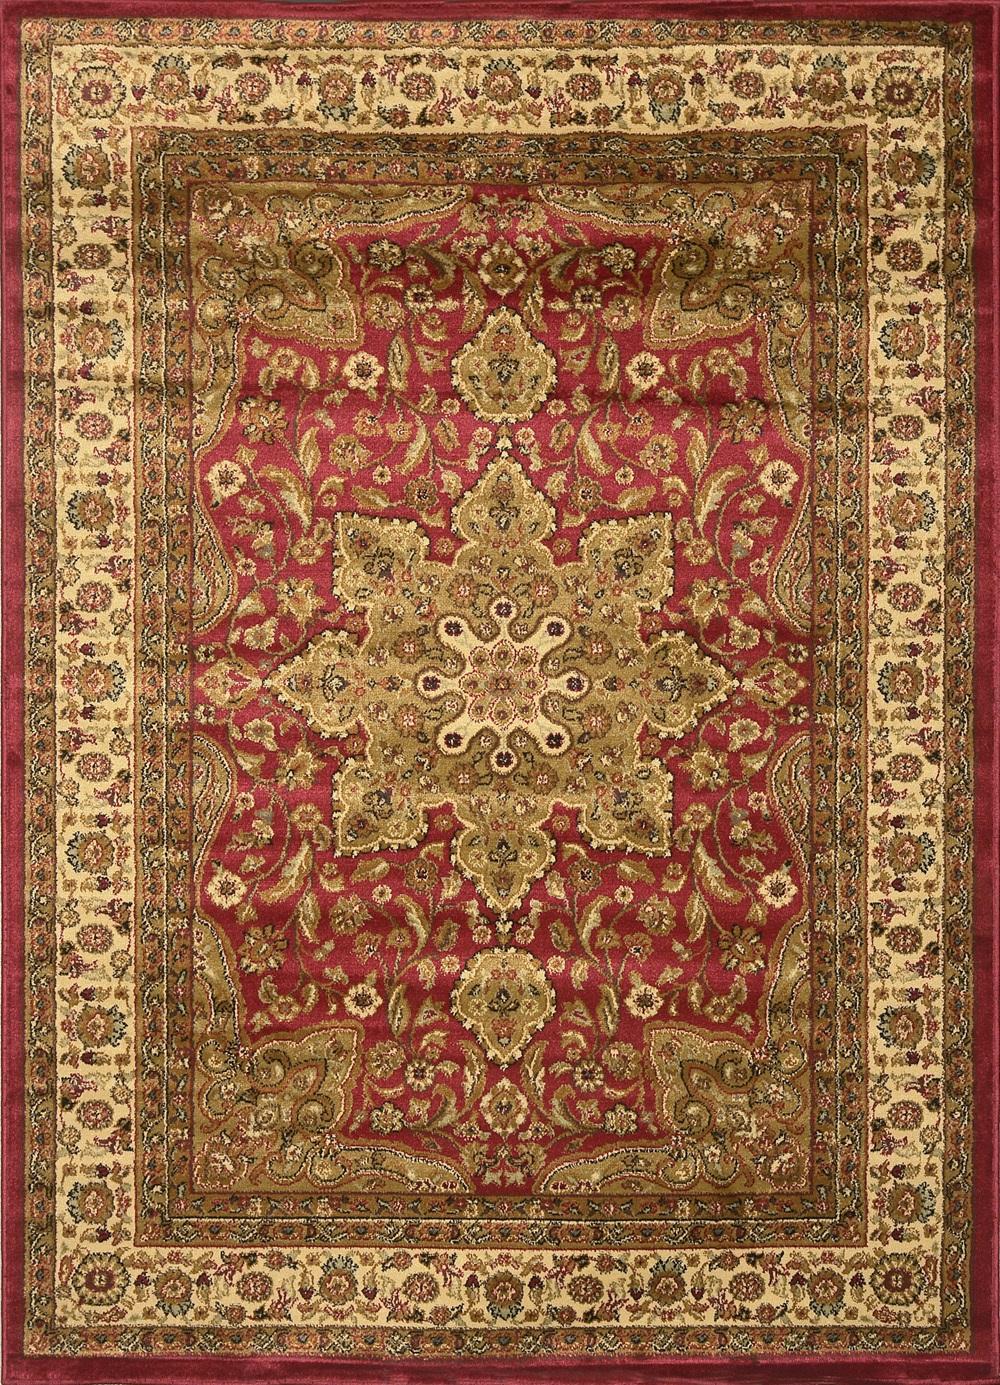 Large Medallion 8 x 11 Persian Area Rug Border Carpet  Actual 7 8 x 10 4  eBay